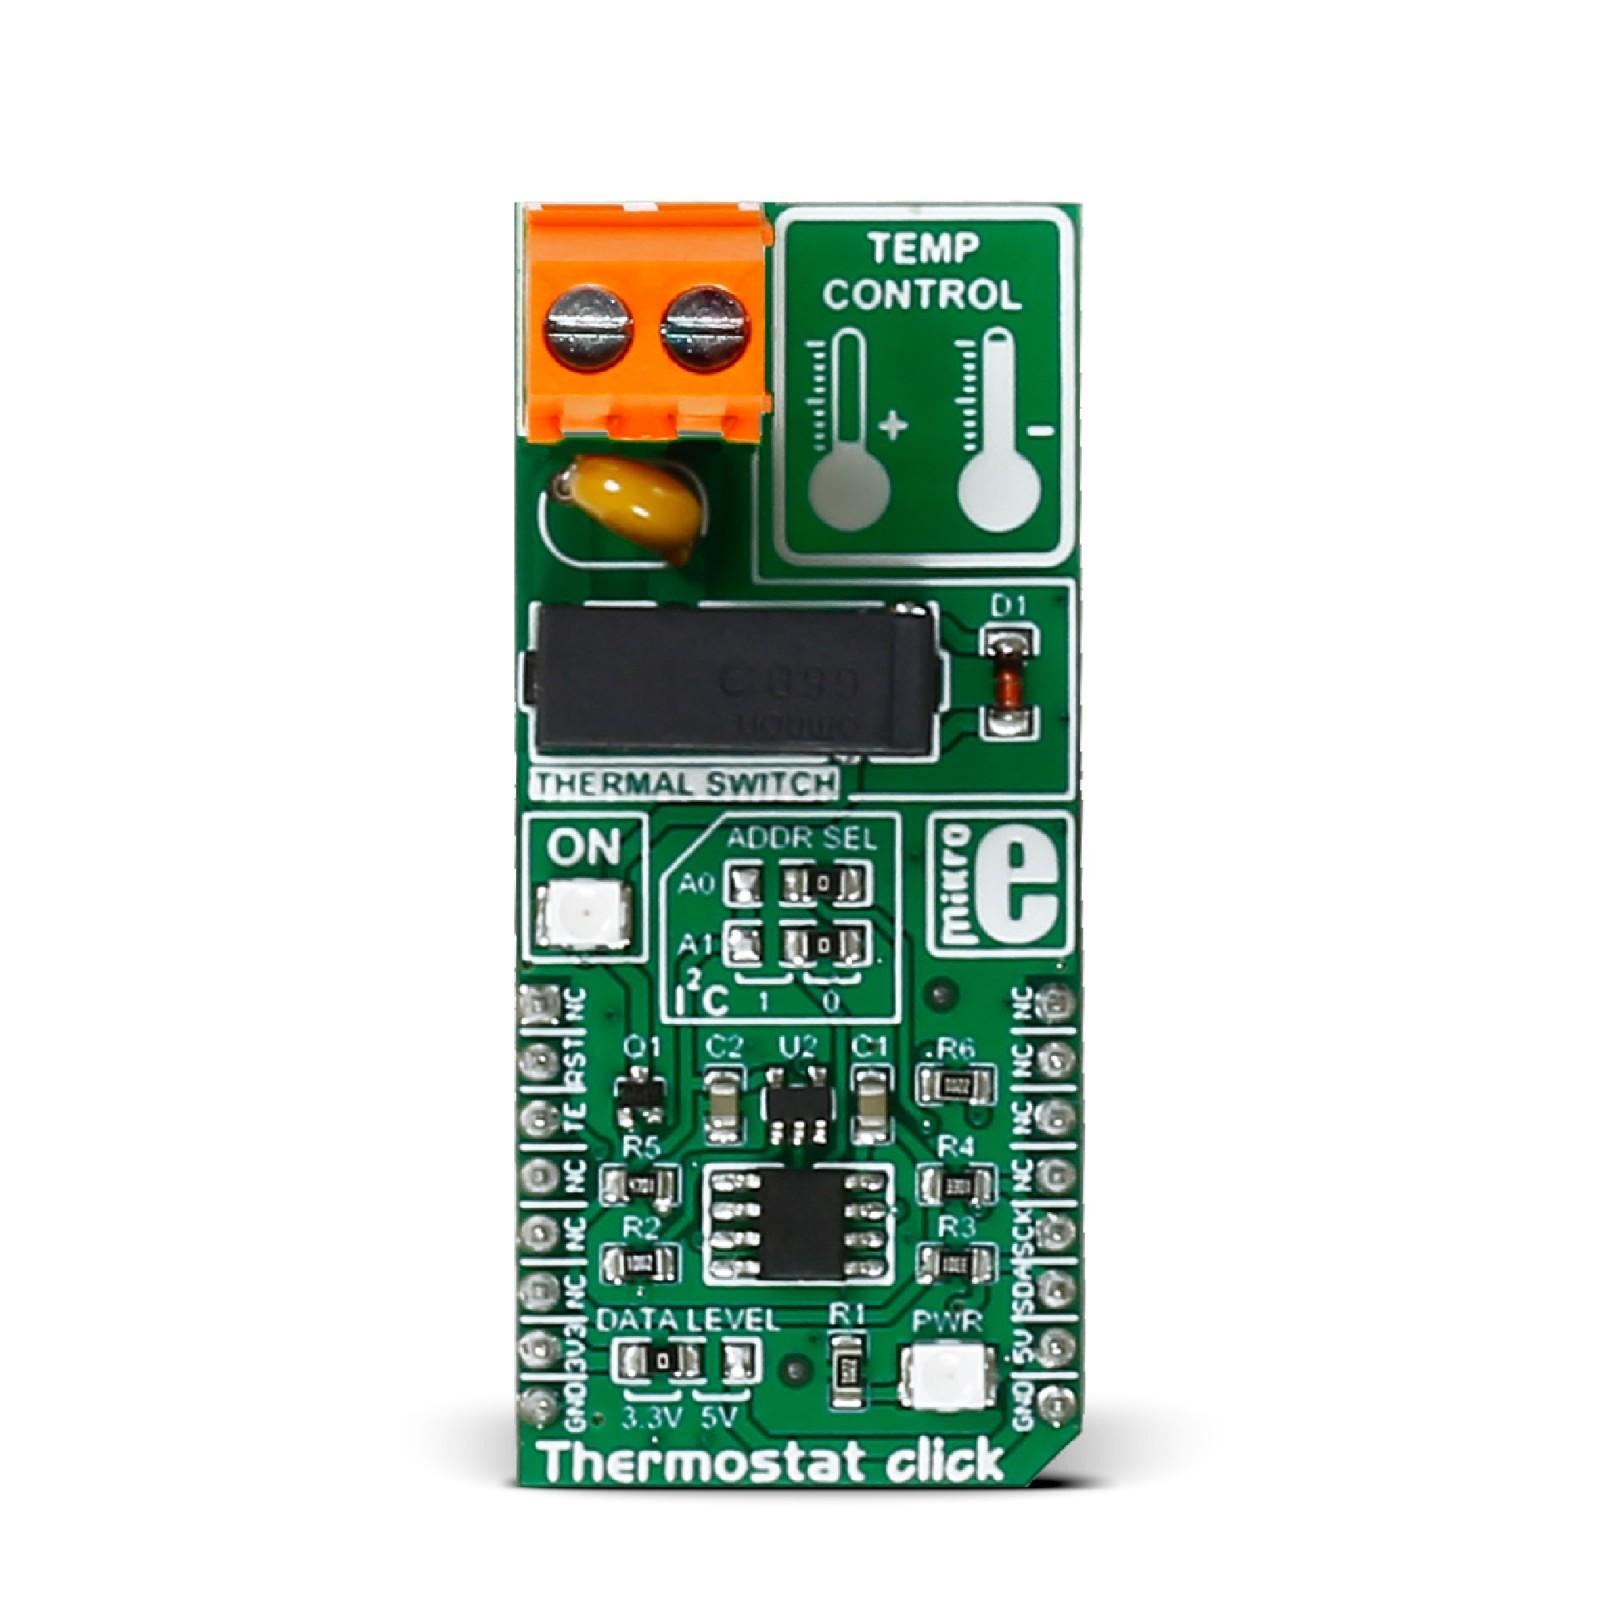 Thermostat click — board with MAX7502 digital temperature sensor